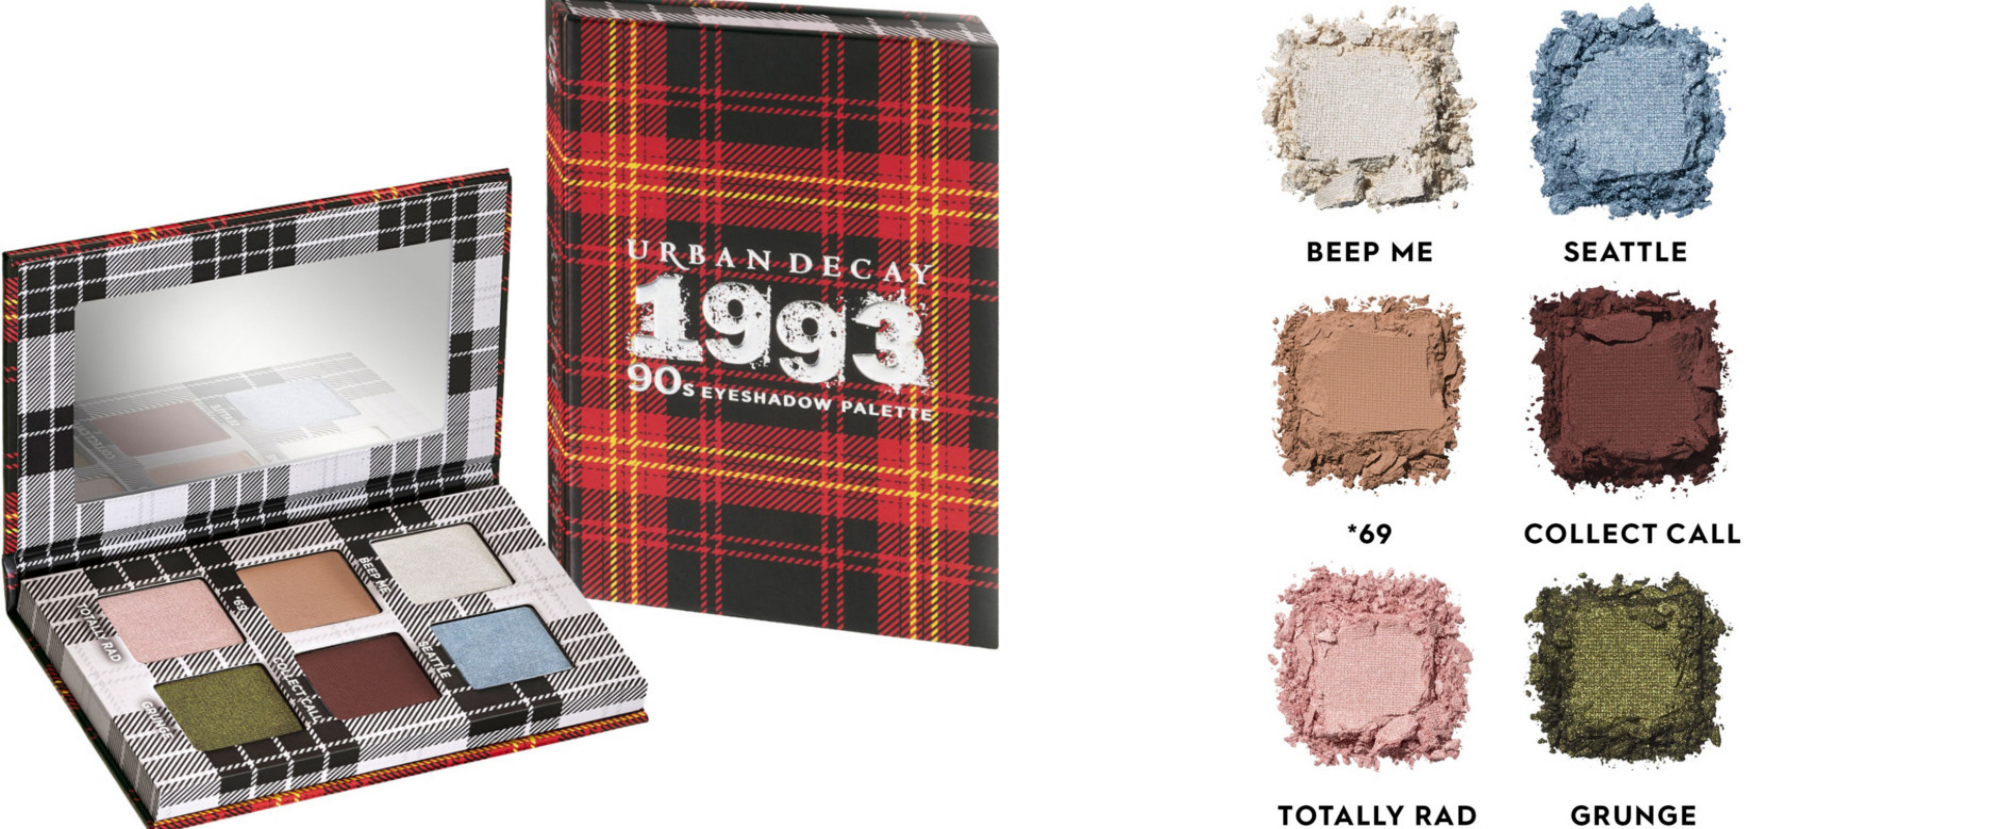 Urban Decay Decades Mini Eyeshadow Palette Collection